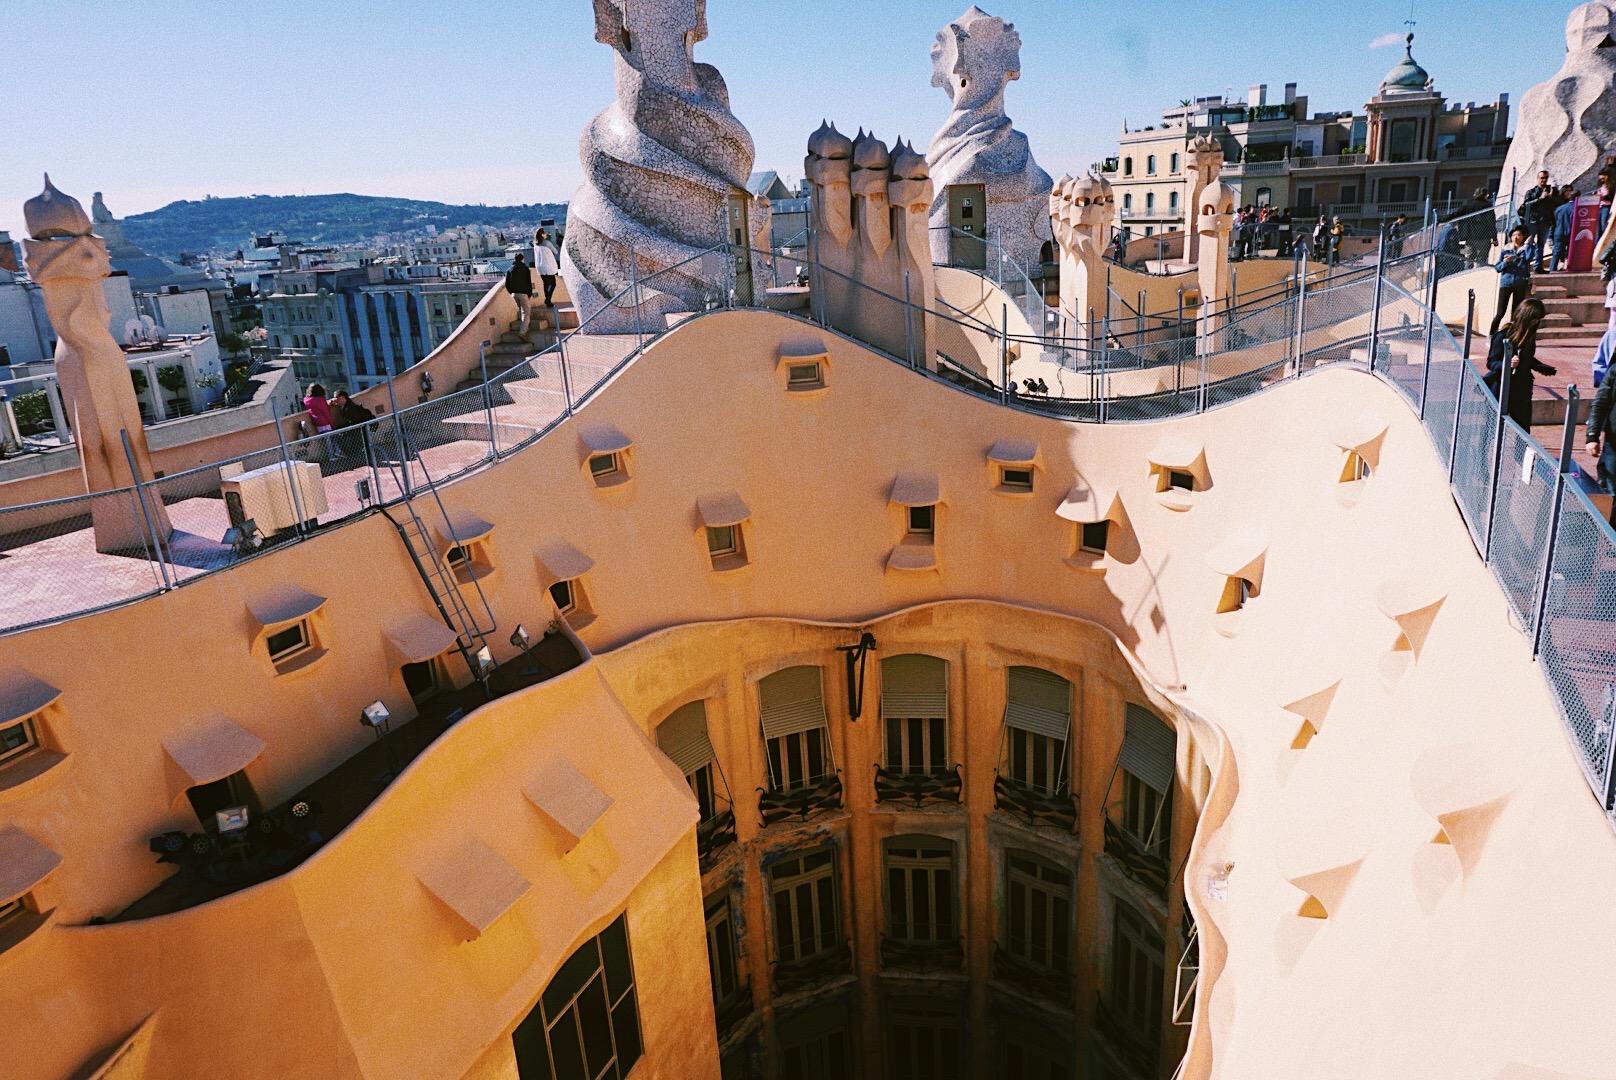 Casa Mila, La Pedrera, Barcelona, Spain